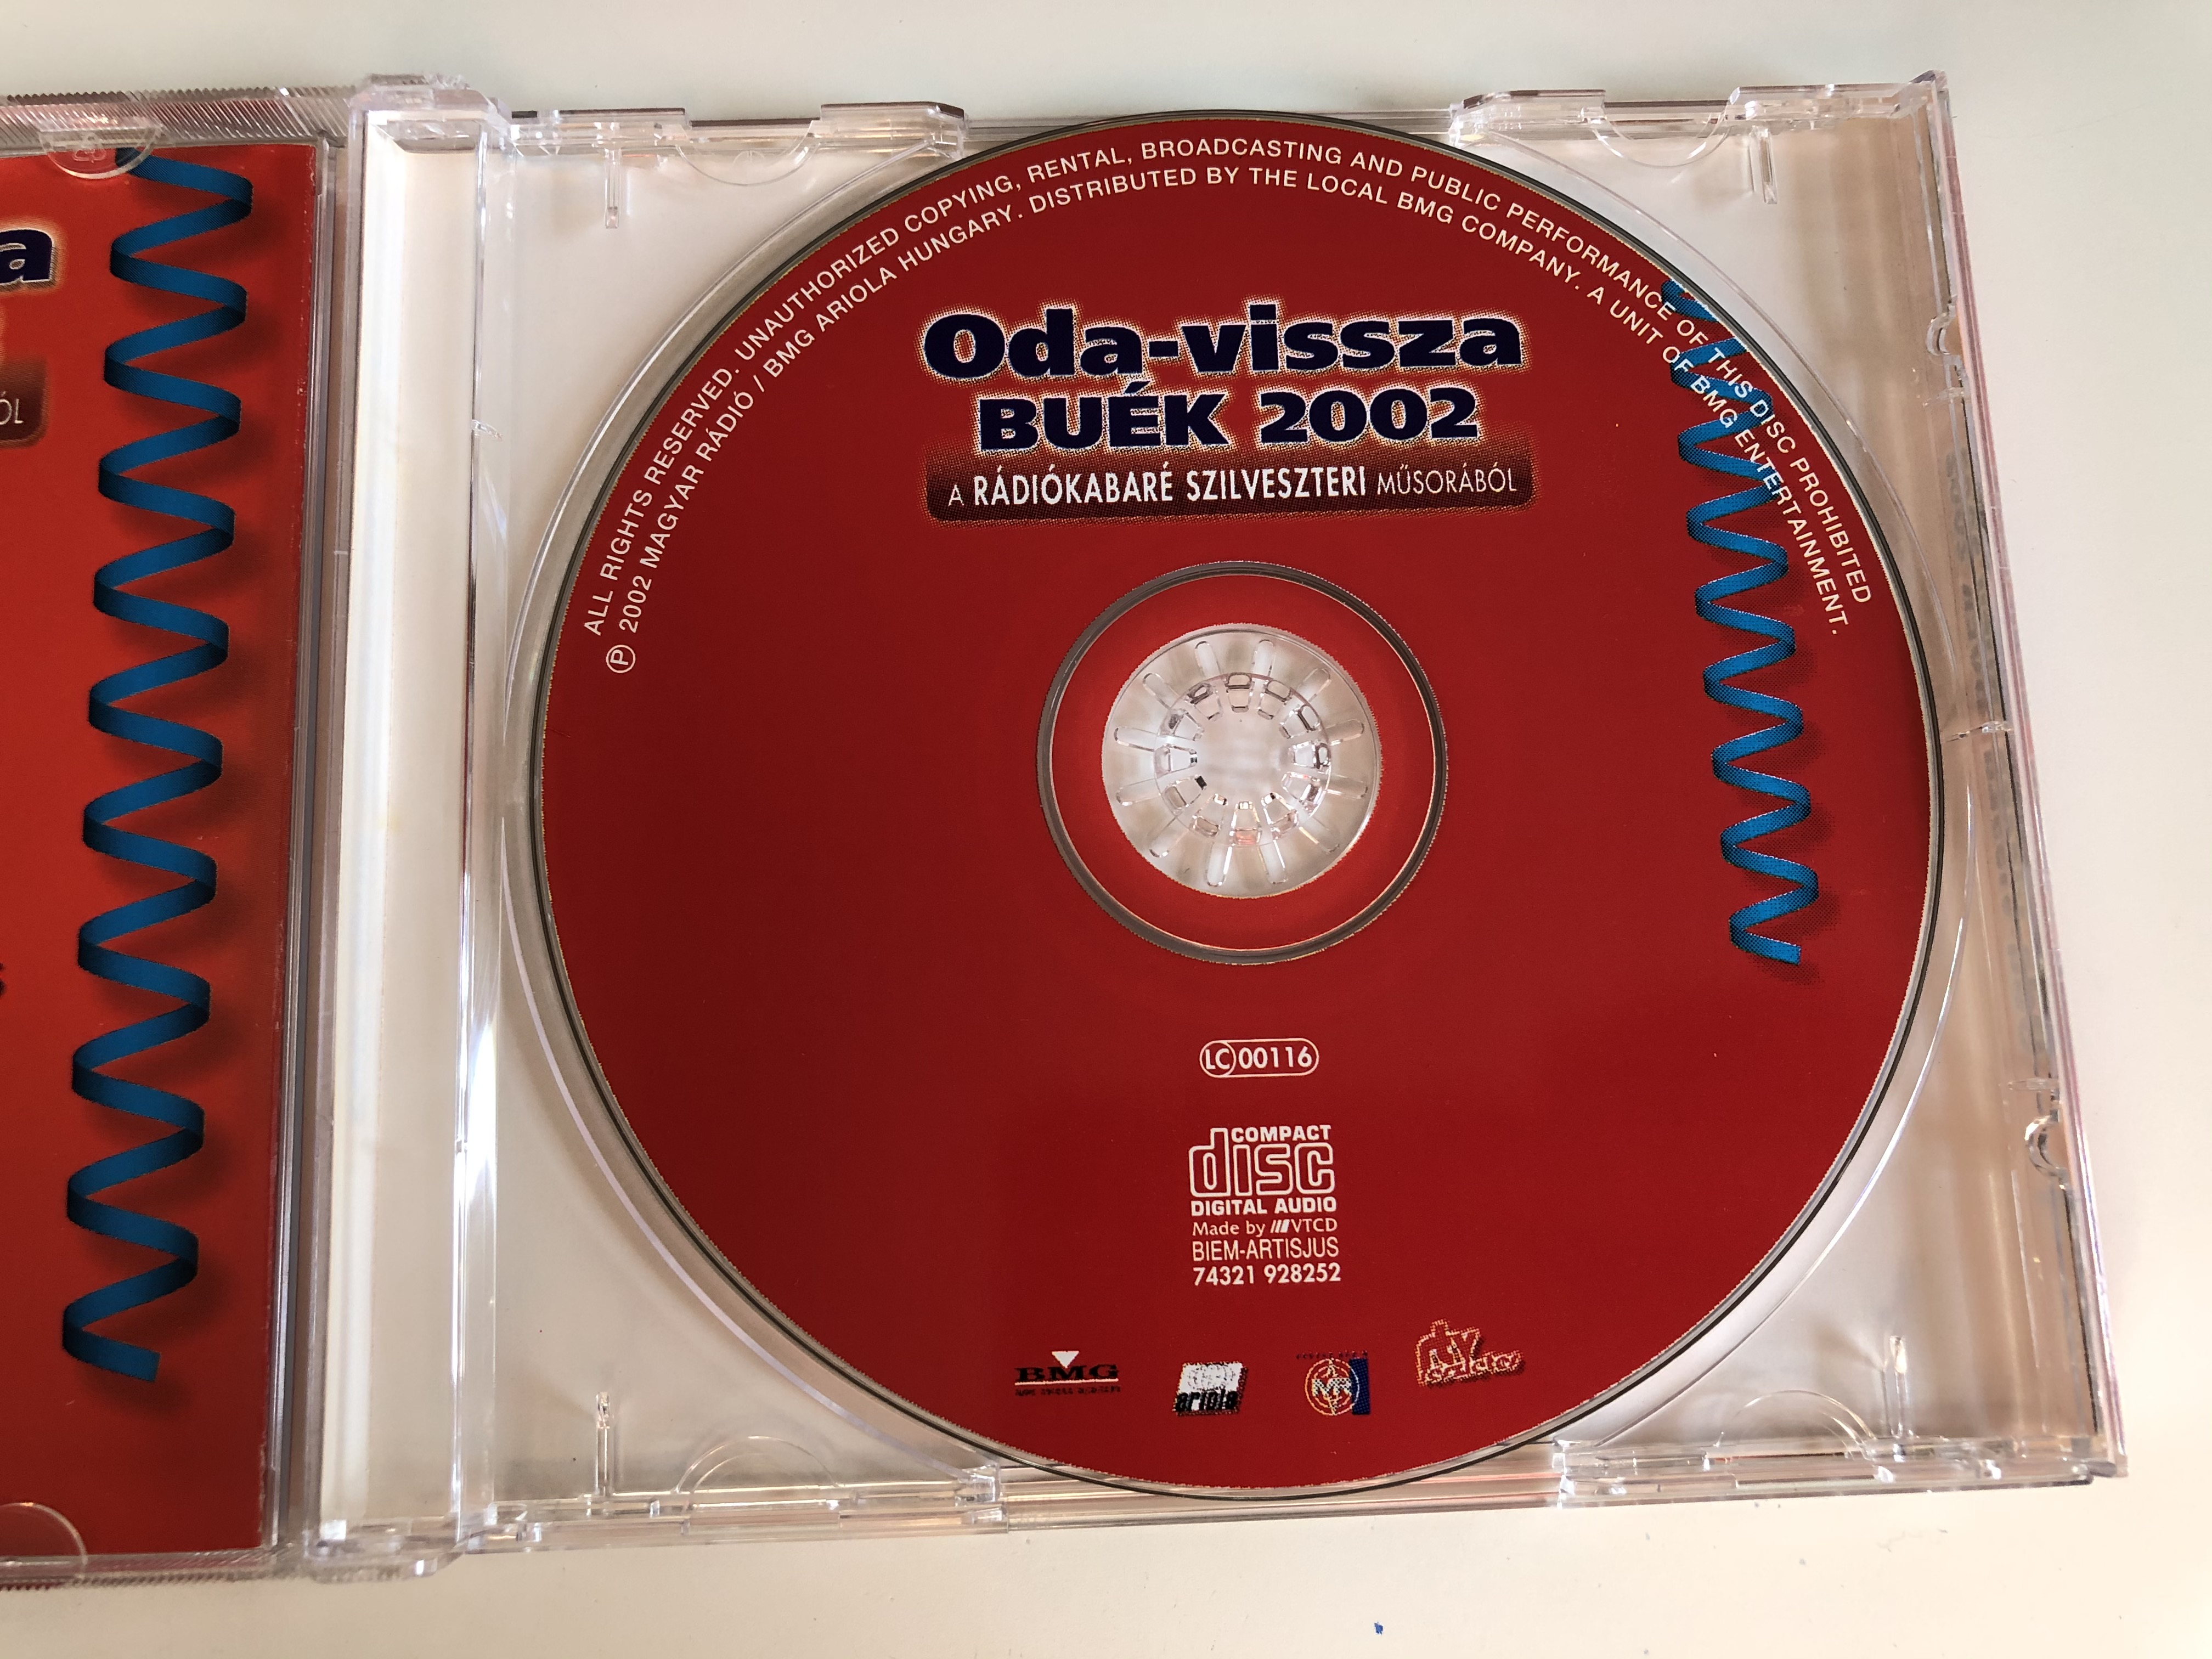 oda-vissza-buek-2002-a-radiokabare-szilveszteri-musorabol-szovivo-fabry-sandor-szerkeszto-rendezo-farkashazy-tivadar-es-sinko-peter-magyar-radio-audio-cd-2002-74321-928252-4-.jpg